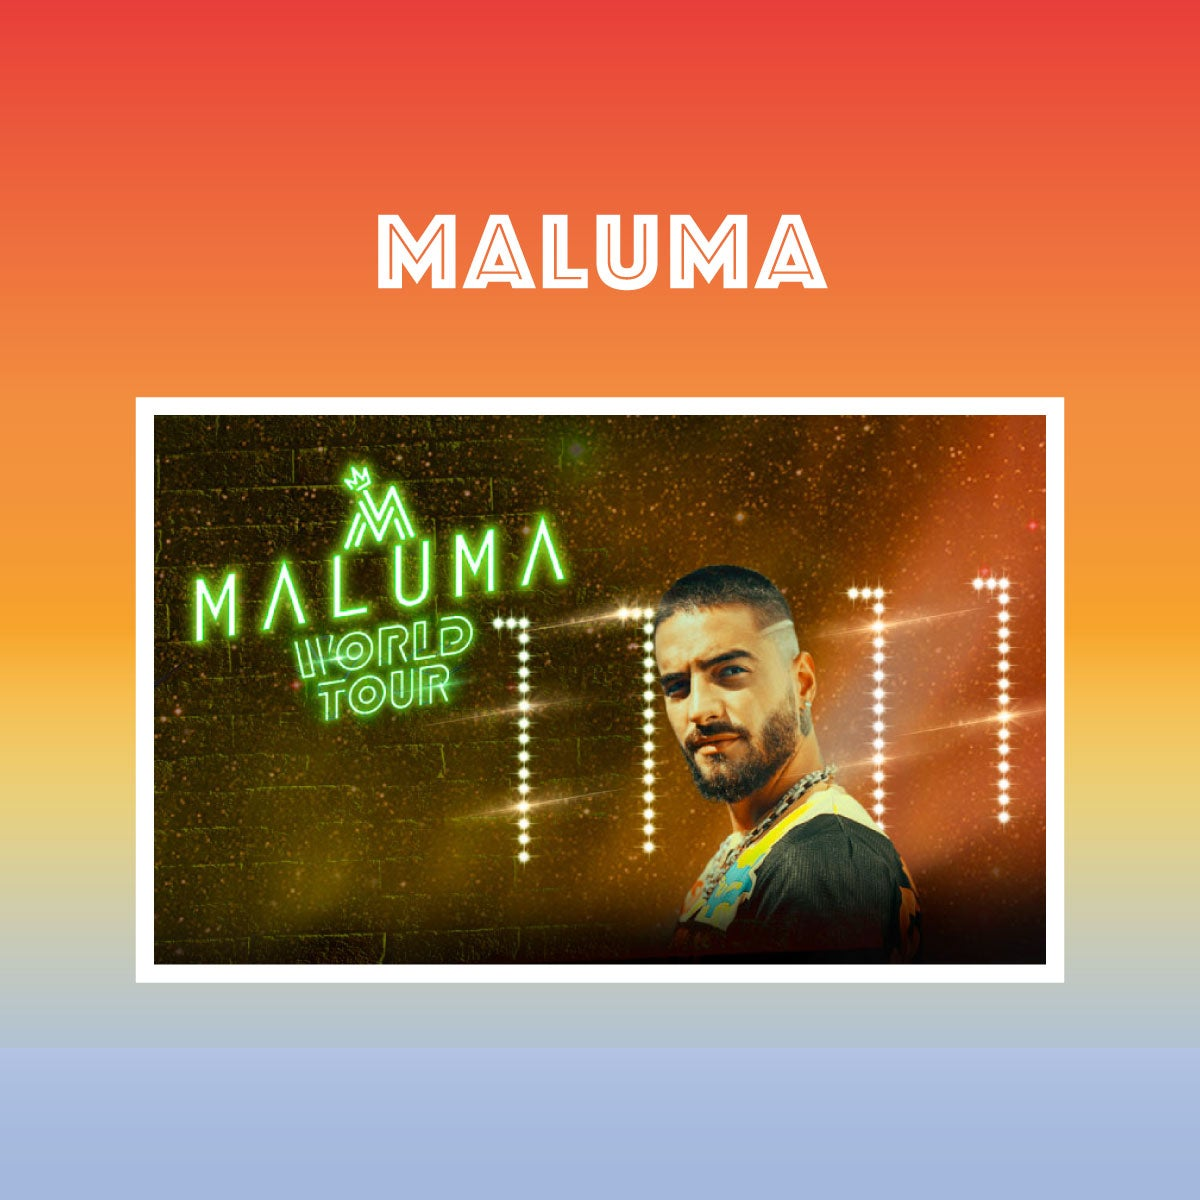 SAPC25-festival-web-maluma-1200x1200.jpg